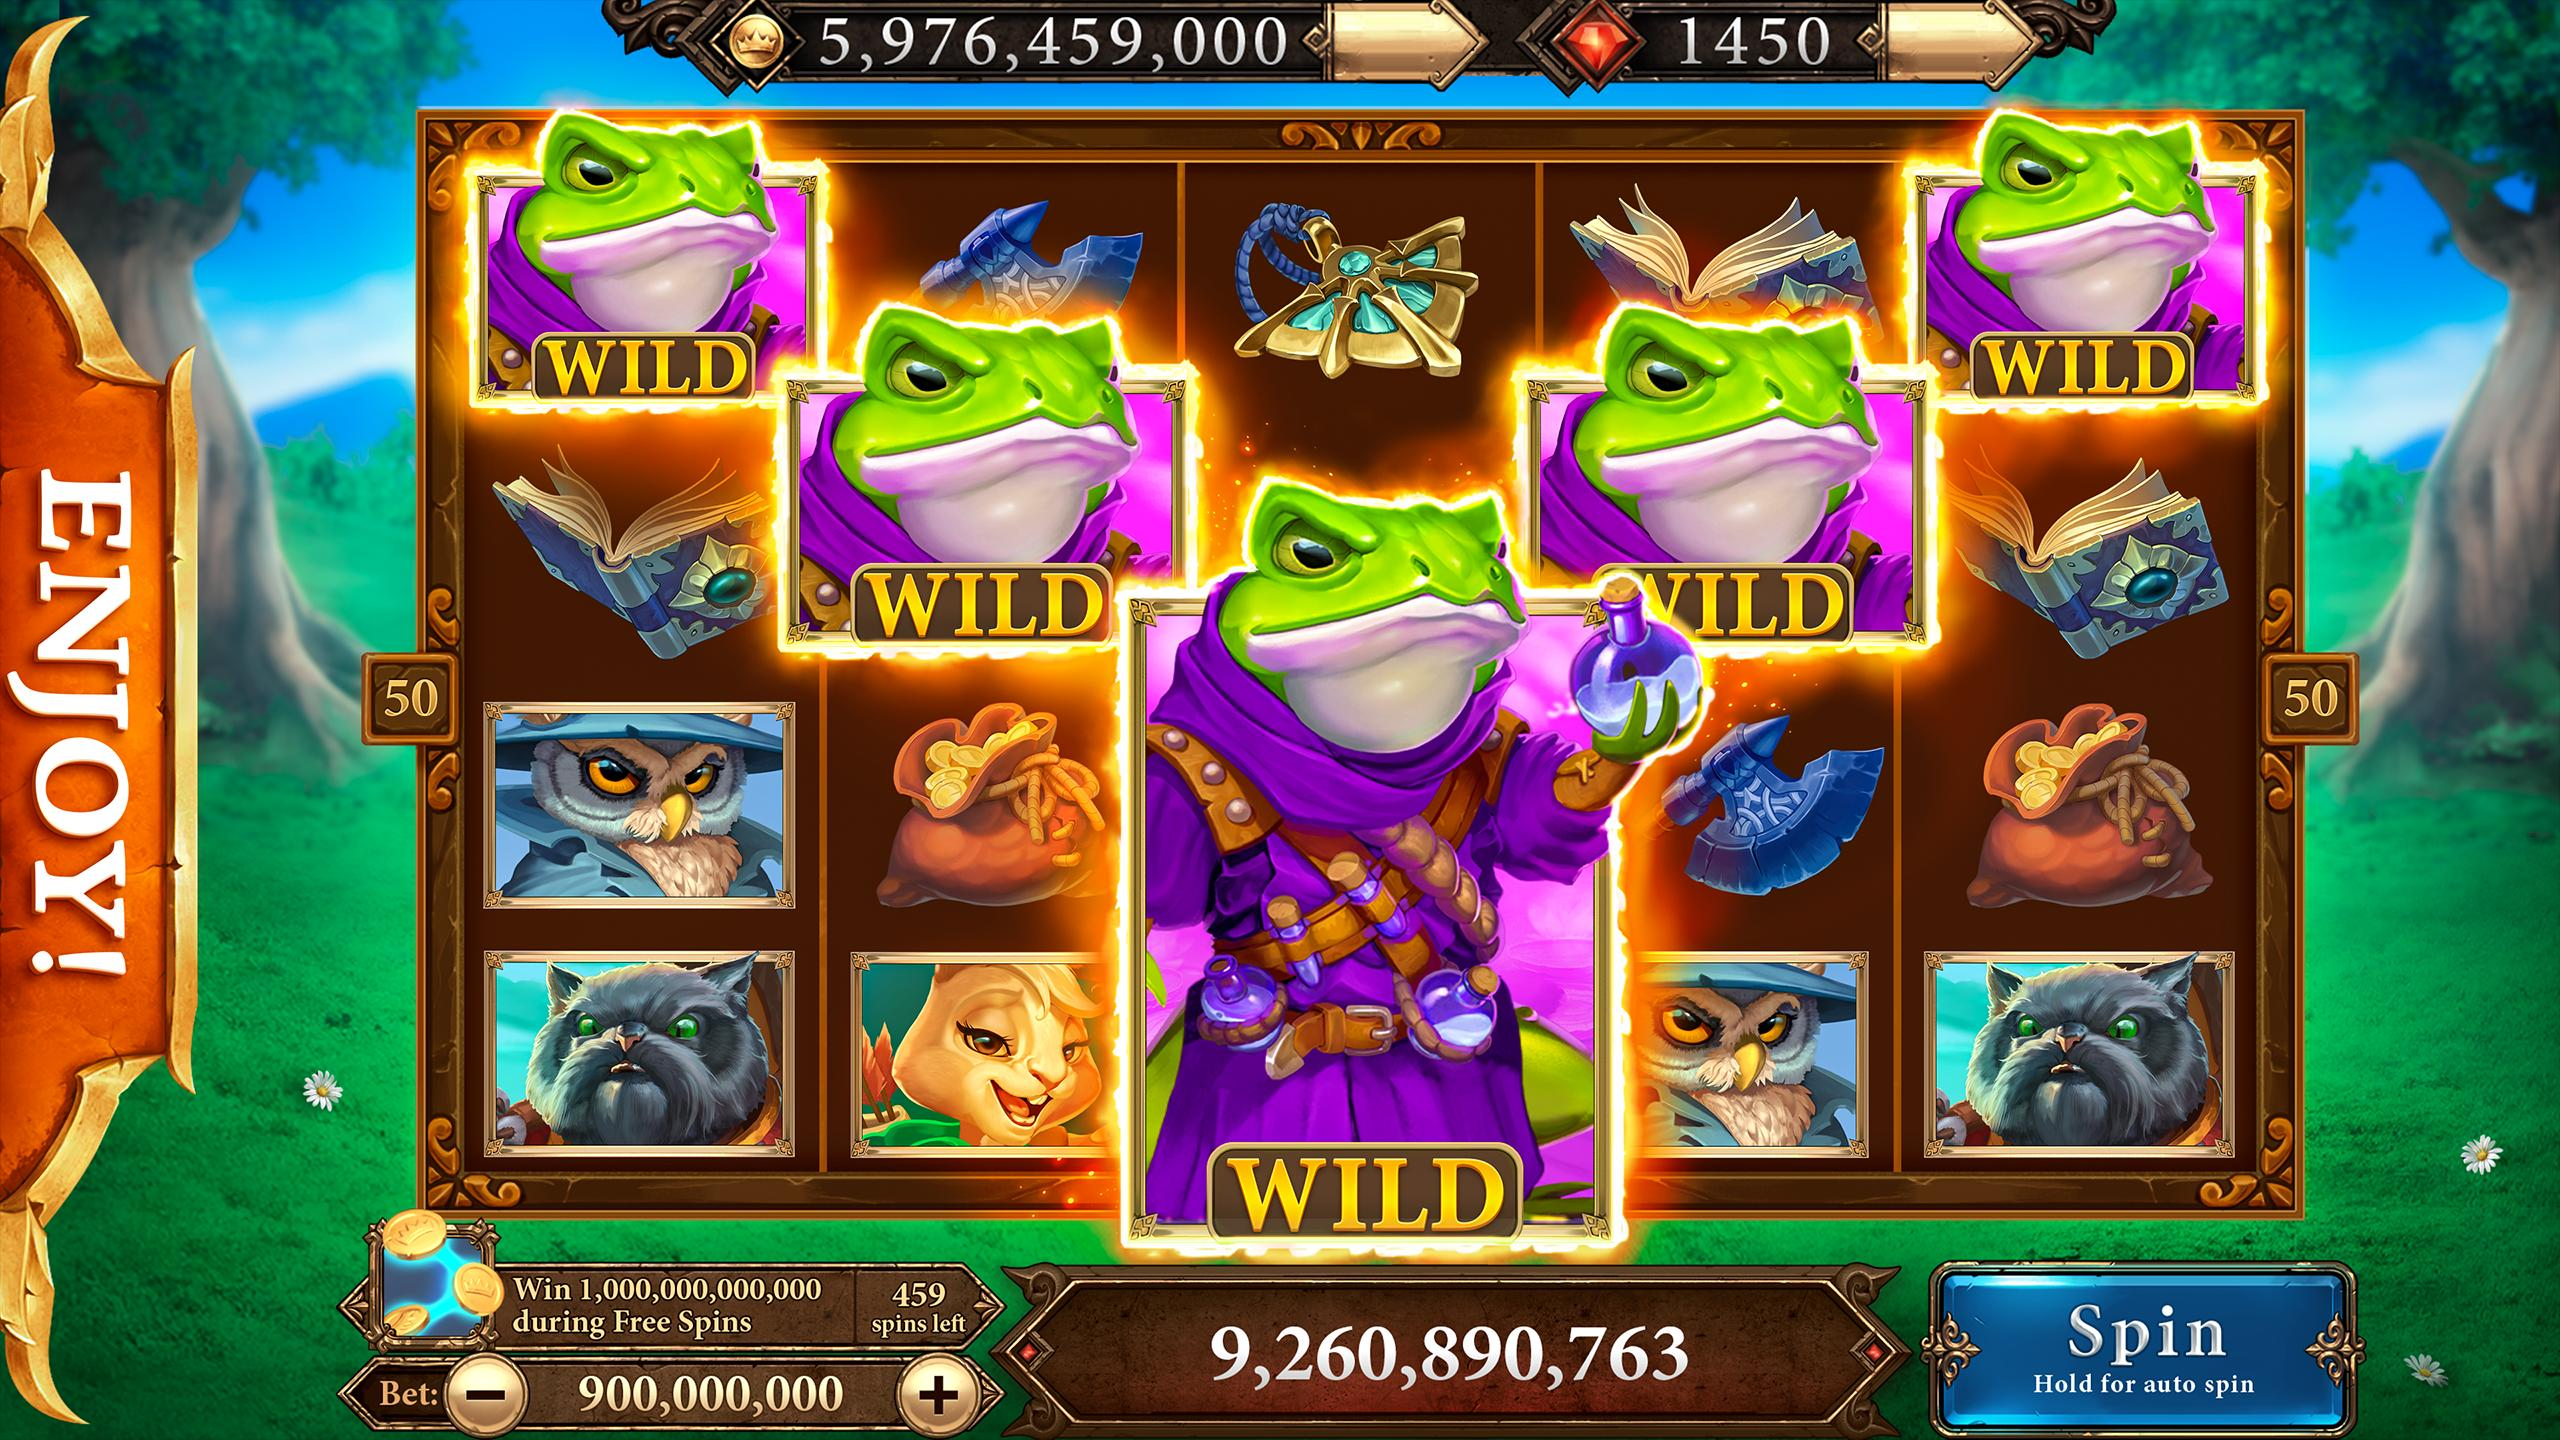 Scatter Slots Las Vegas Casino Game 777 Online 3.87.0 Screenshot 3